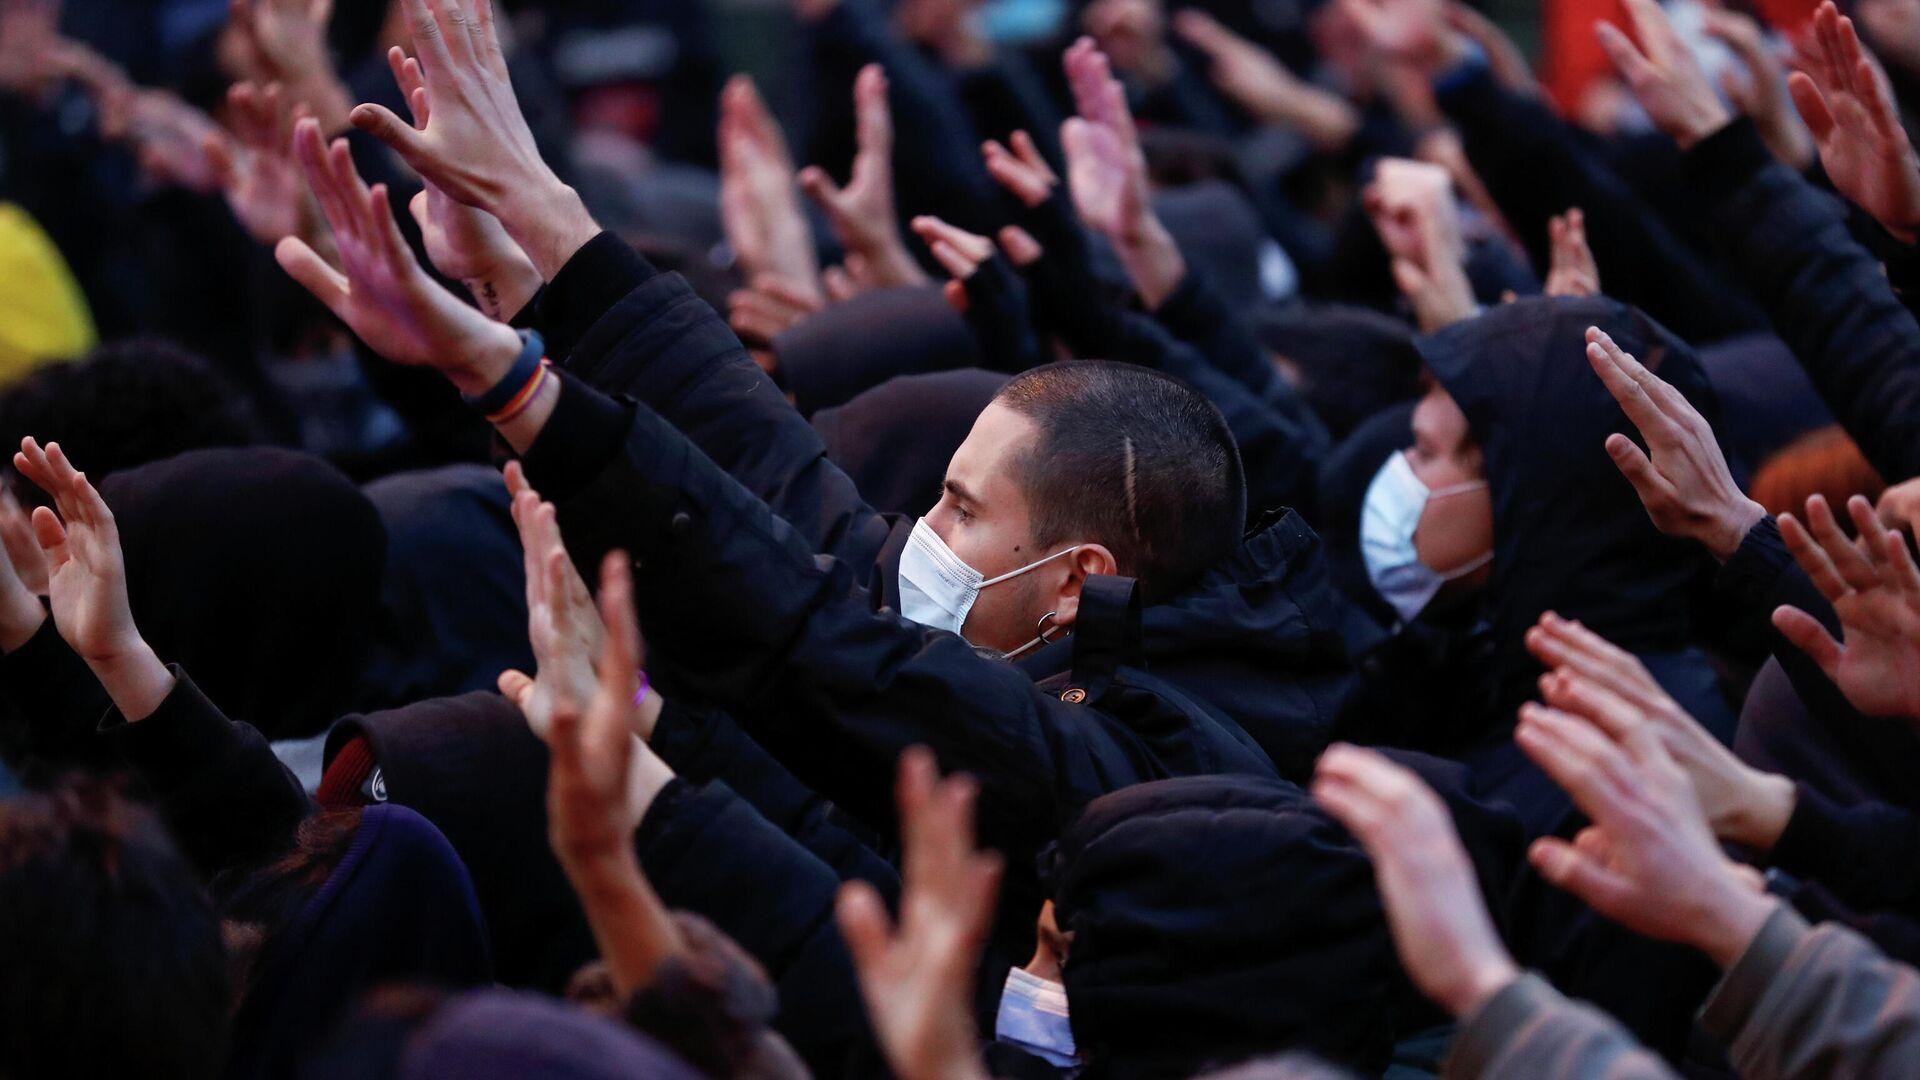 Protestas en apoyo al rapero Pablo Hasél en Madrid - Sputnik Mundo, 1920, 20.03.2021